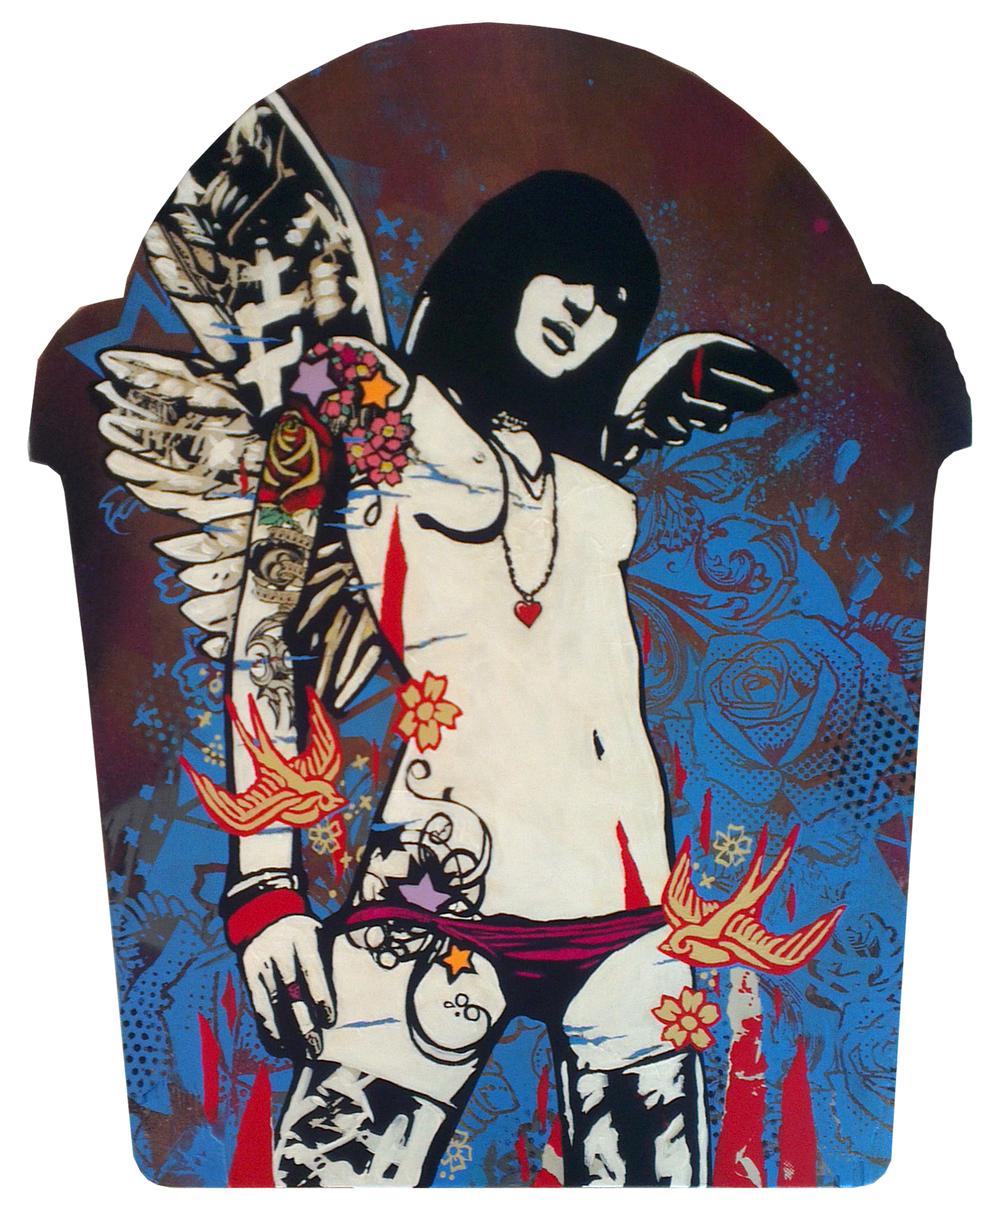 Untitled, Acrylic on Wood, 55 x 60cm, £550.00 SOLD 036.jpg